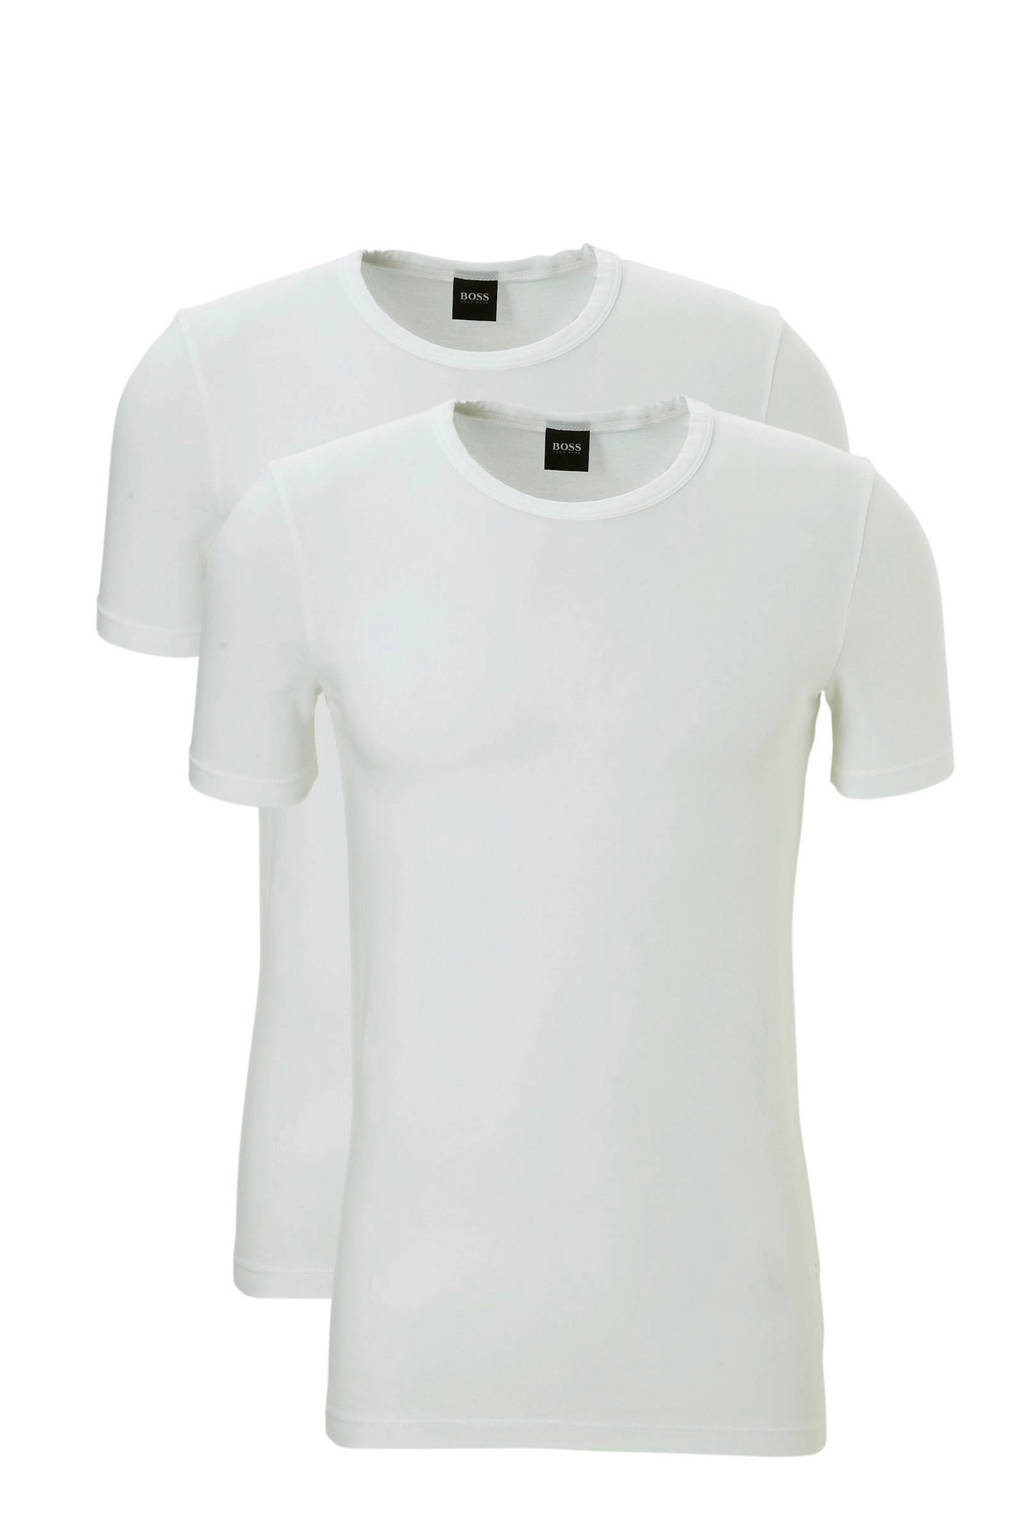 Boss T-shirt (set van 2) wit, Wit